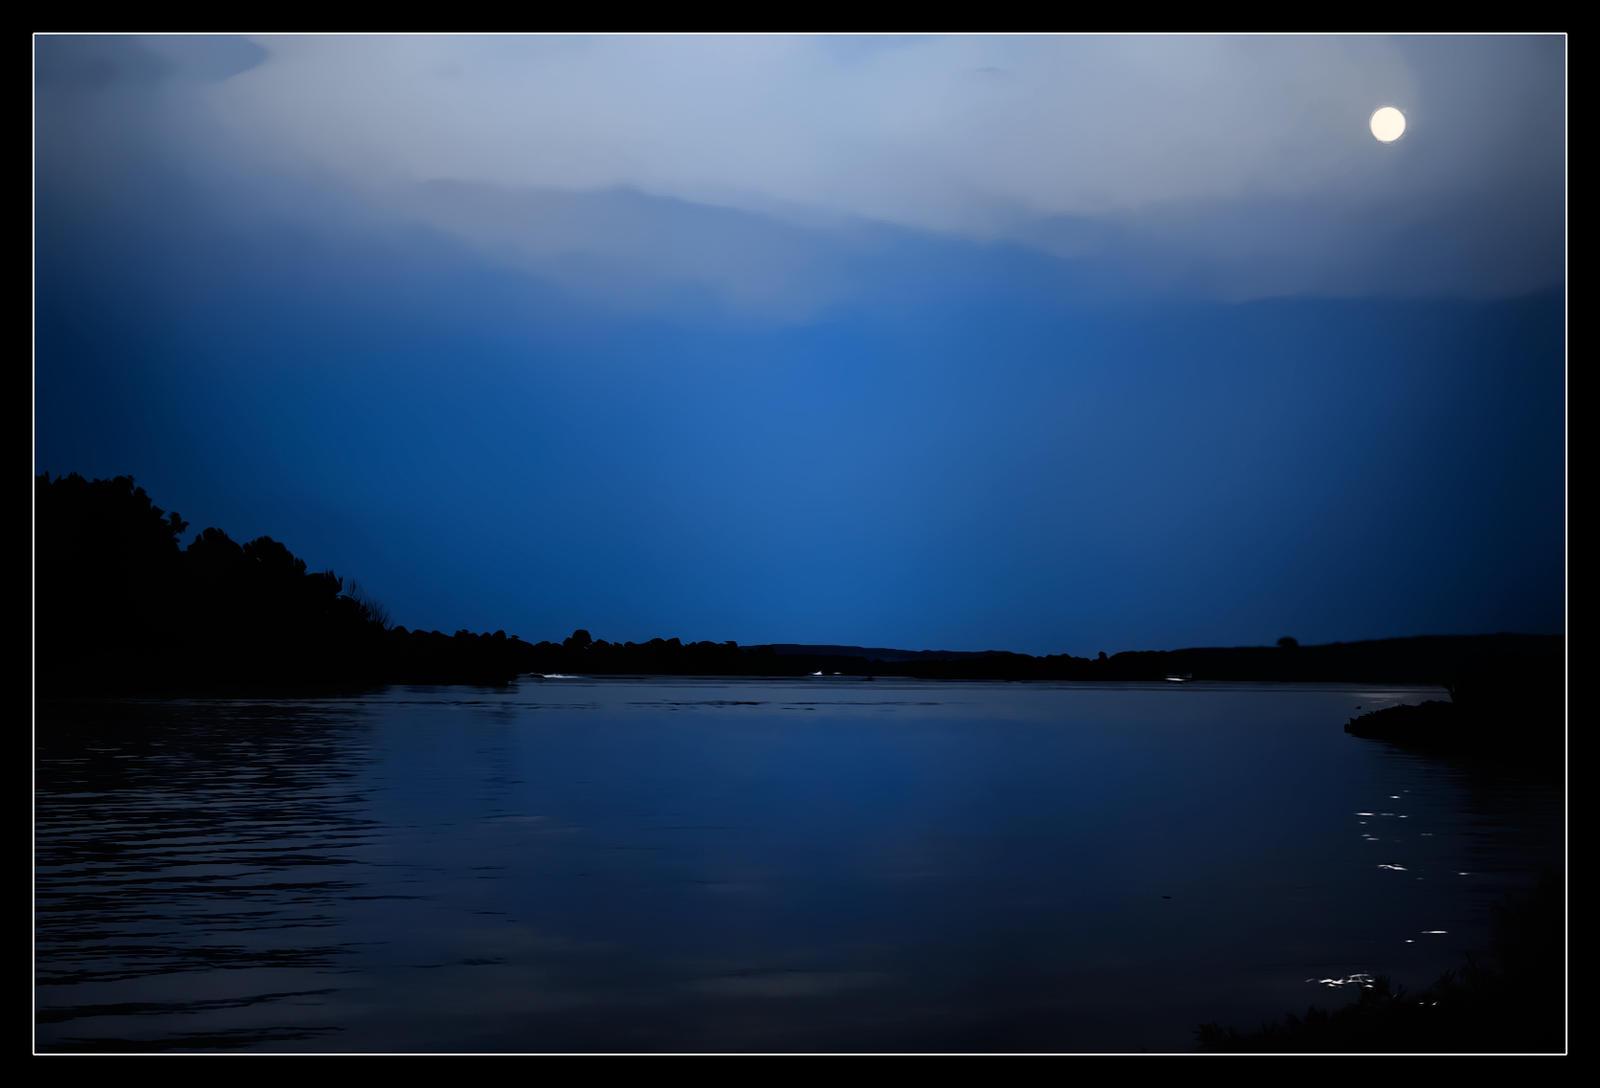 Moon River by joelht74 on DeviantArt